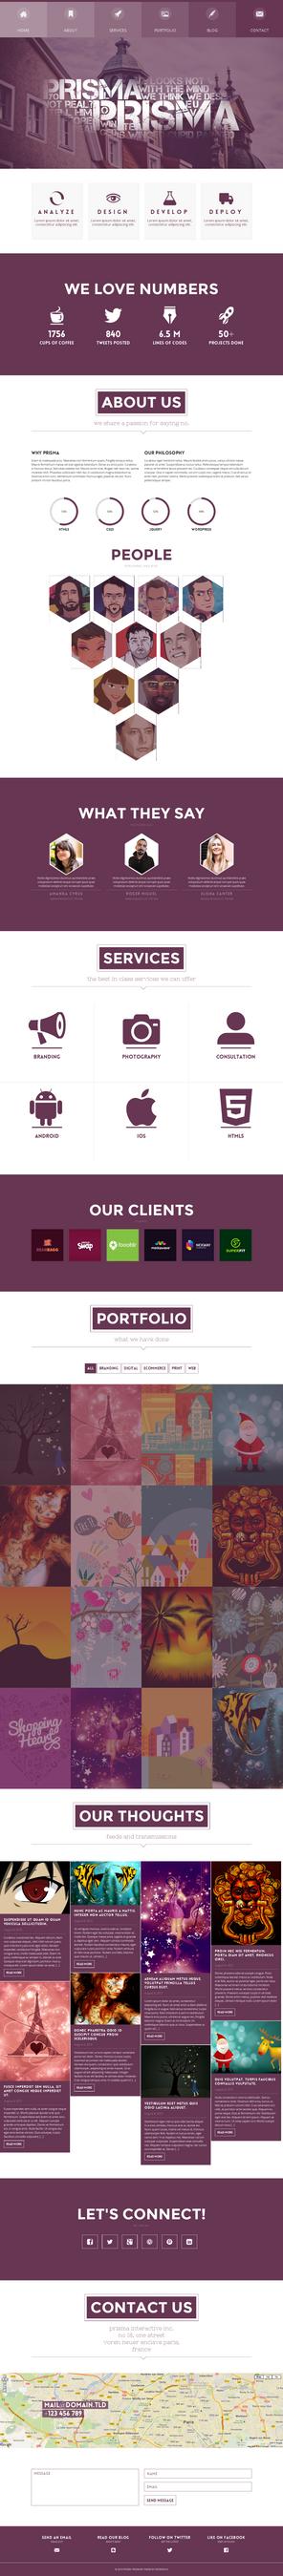 Prisma CreAtive WordPress by webdesigngeek